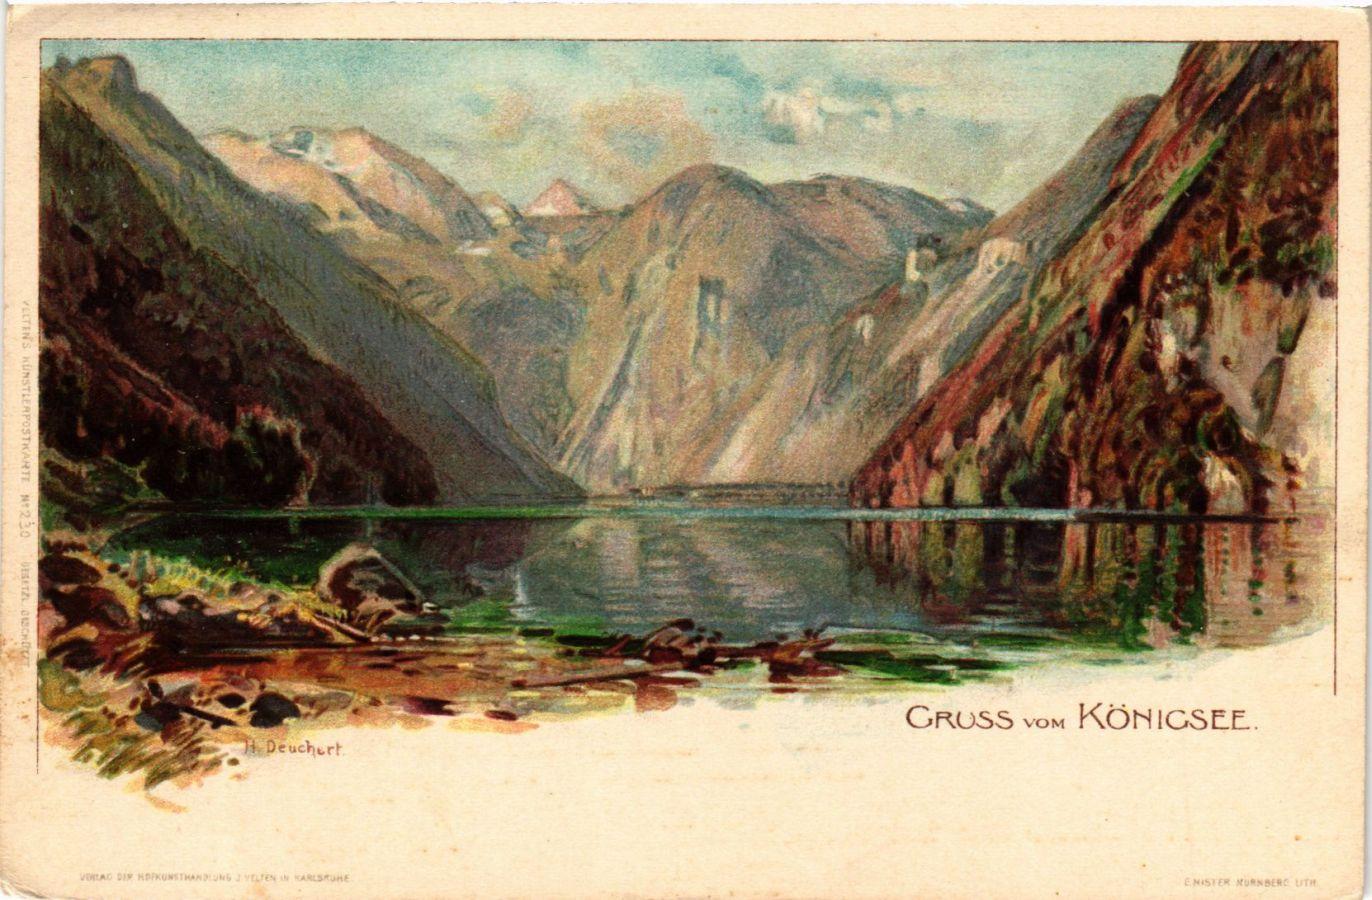 CPA-AK-Konigssee-Gruss-vom-Konigsee-GERMANY-879458